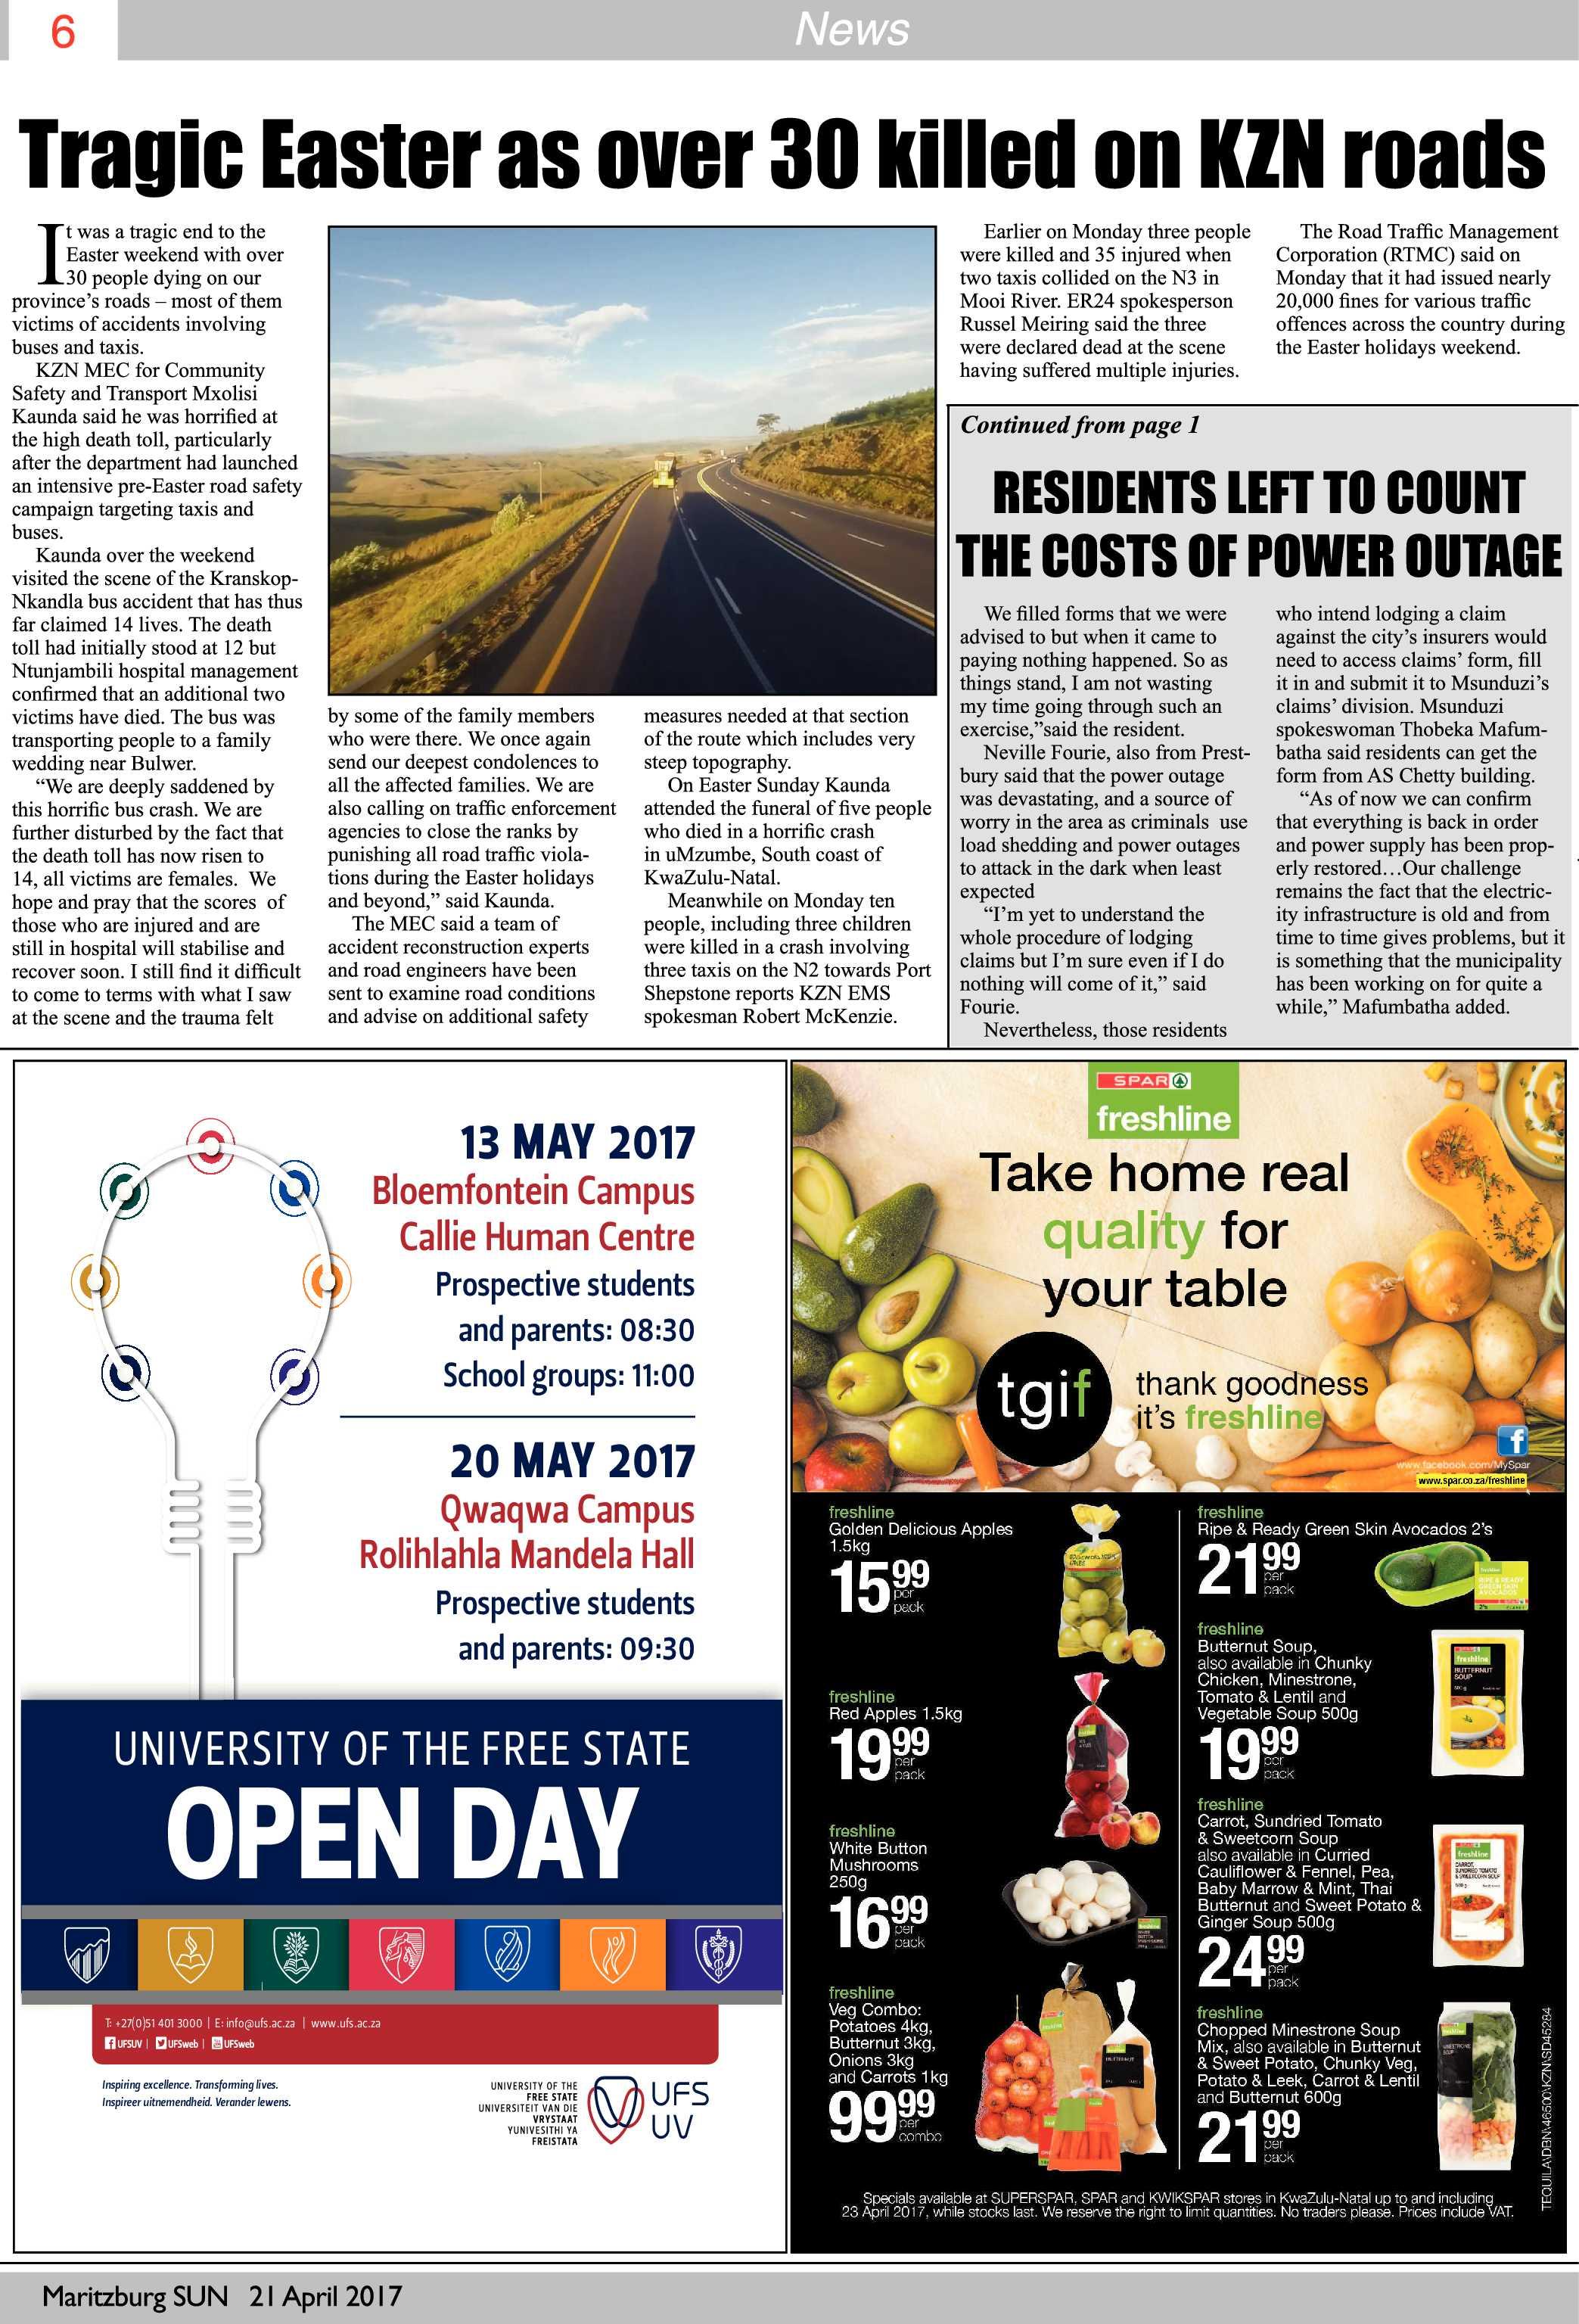 maritzburgsun-21-04-2017-epapers-page-6